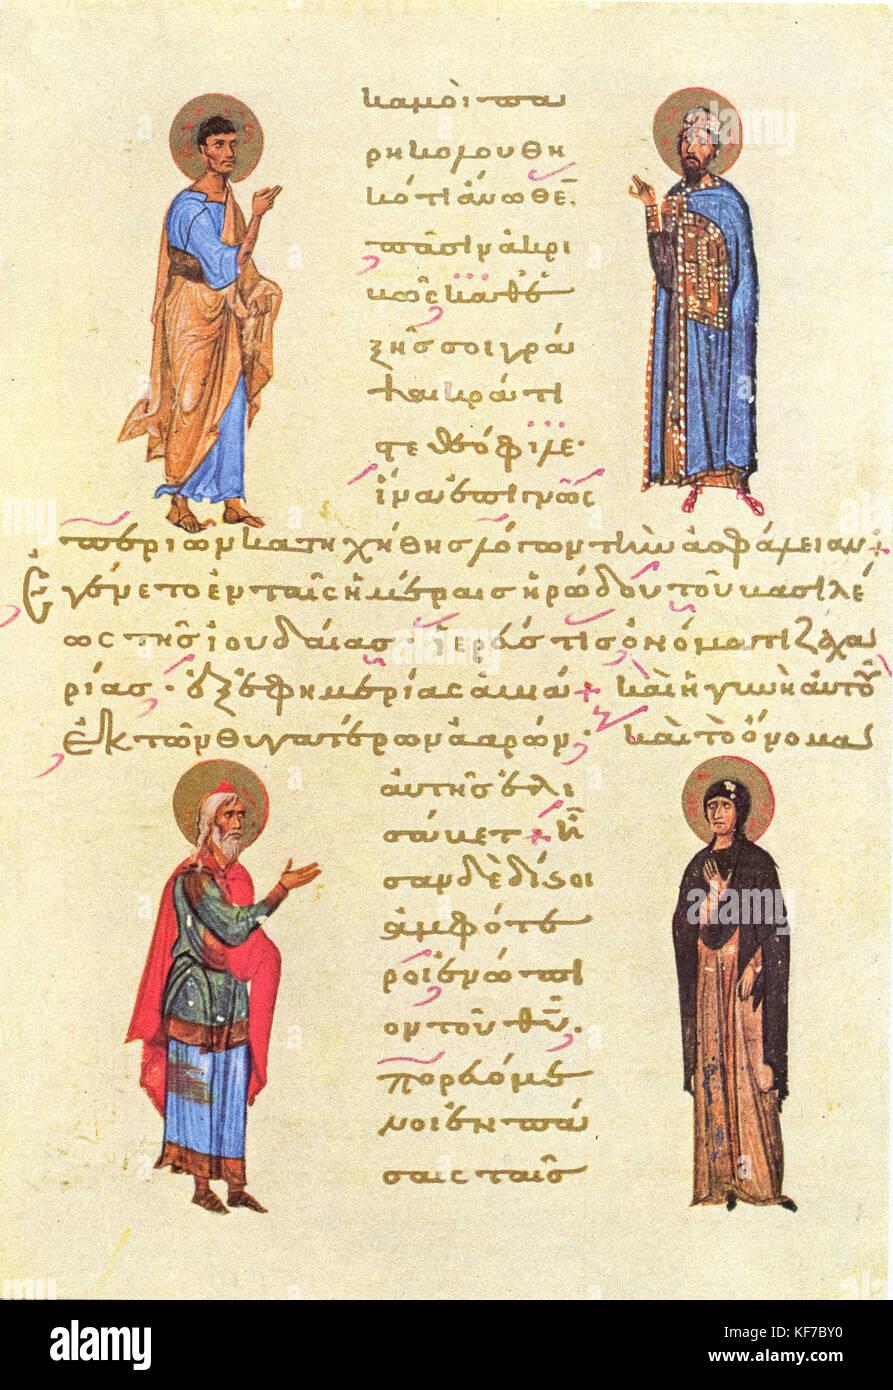 France Paris National Library - Images of Saints - Grec 64 - XI century - Stock Image